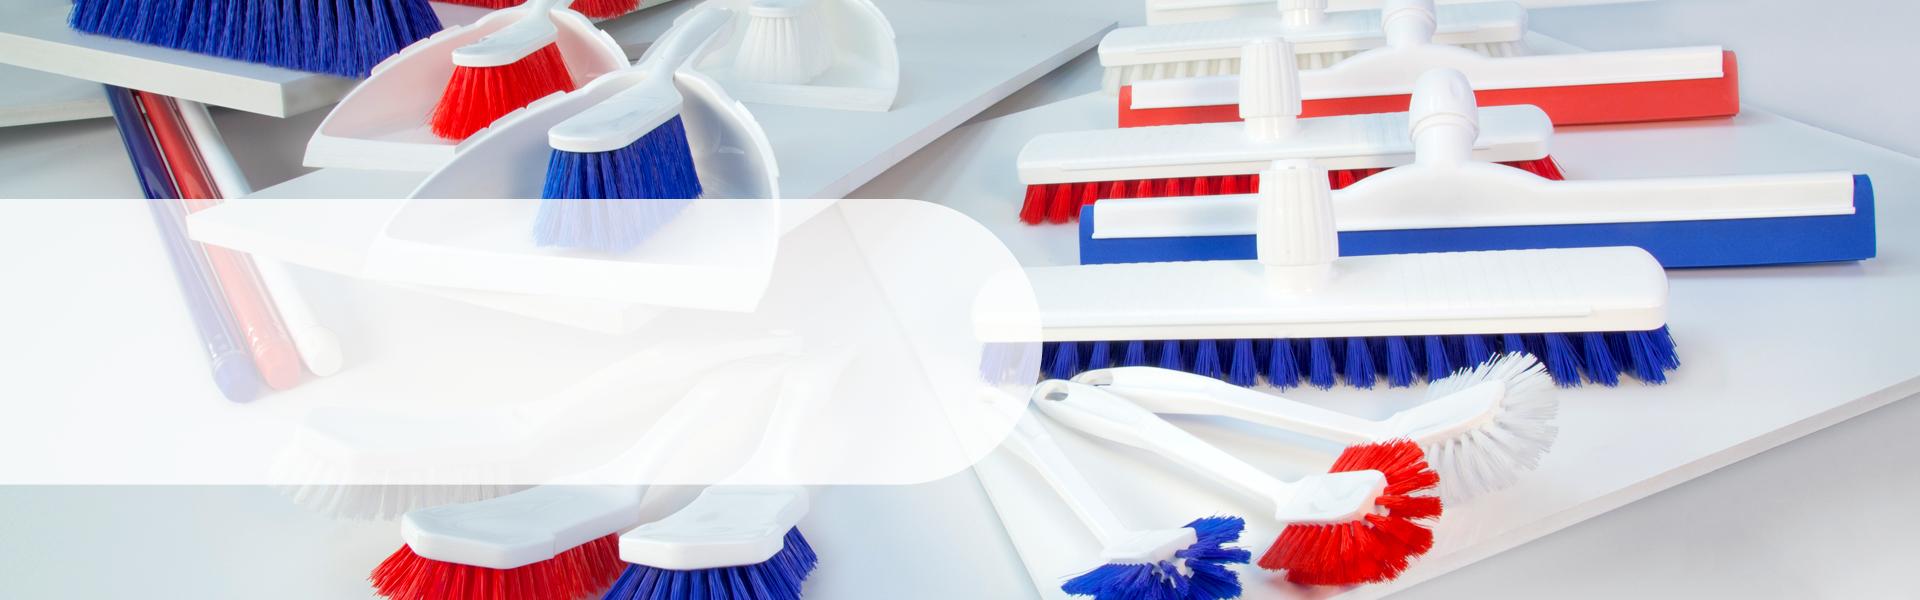 Bürstenmann GmbH: Das neue HACCP-Sortiment